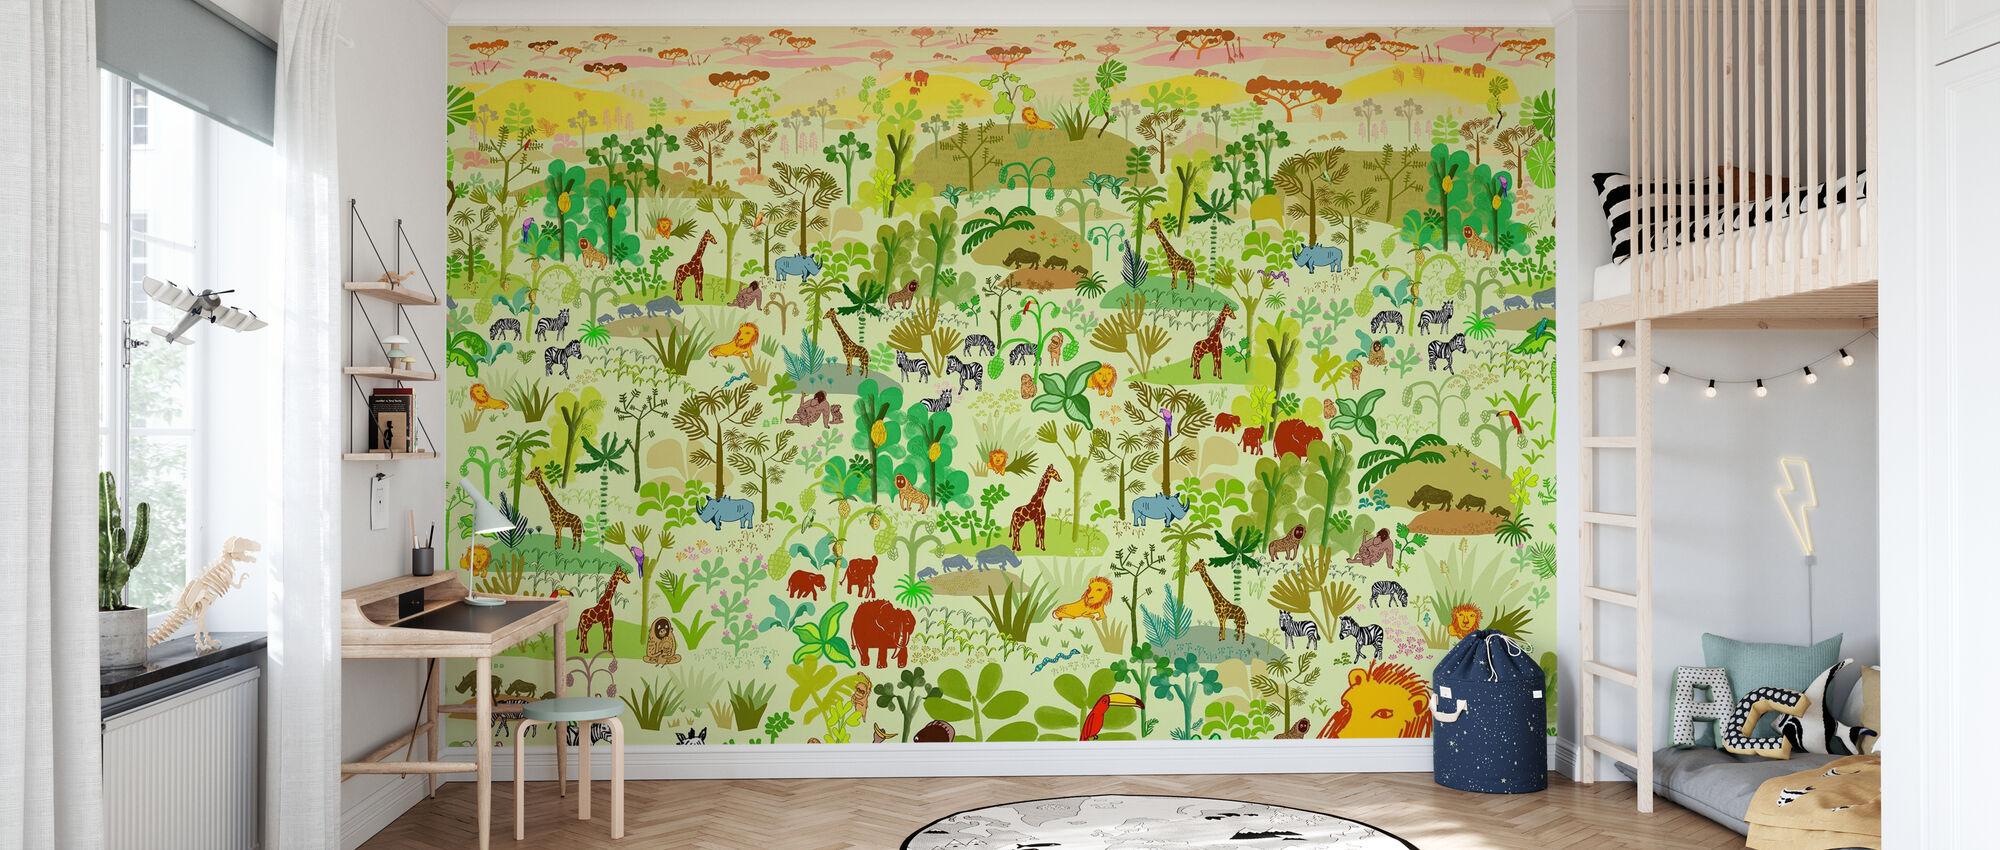 Serengeti - Wallpaper - Kids Room